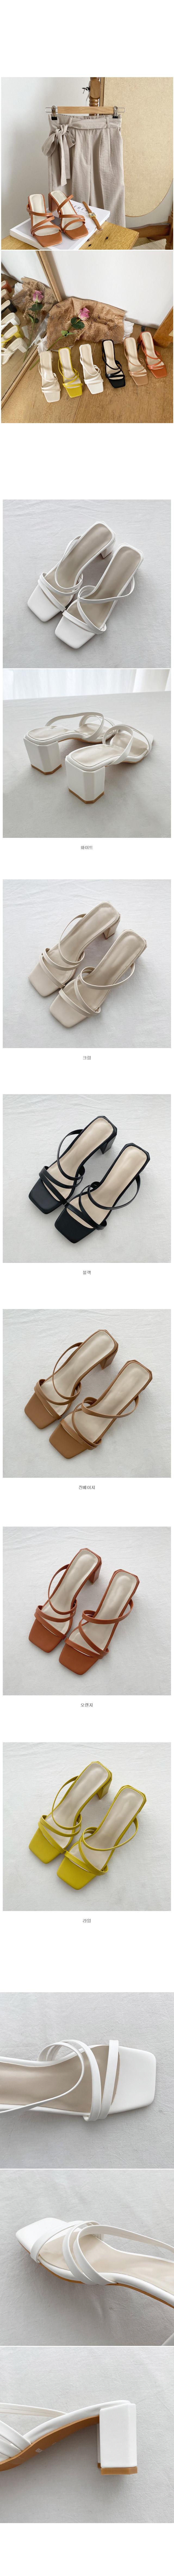 Peach strap sandal heel